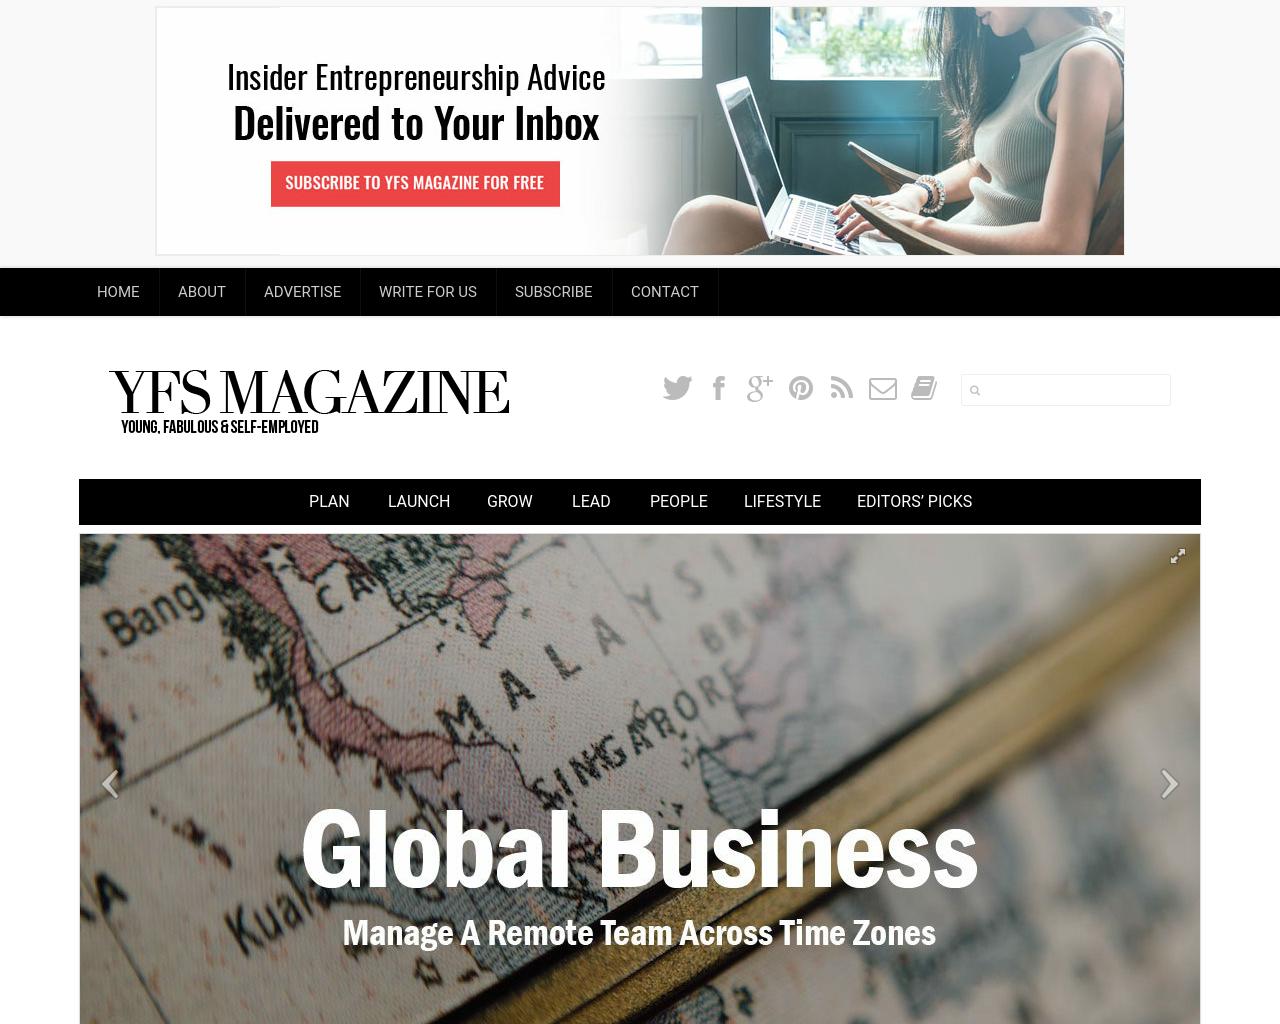 YFS-Magazine-Advertising-Reviews-Pricing